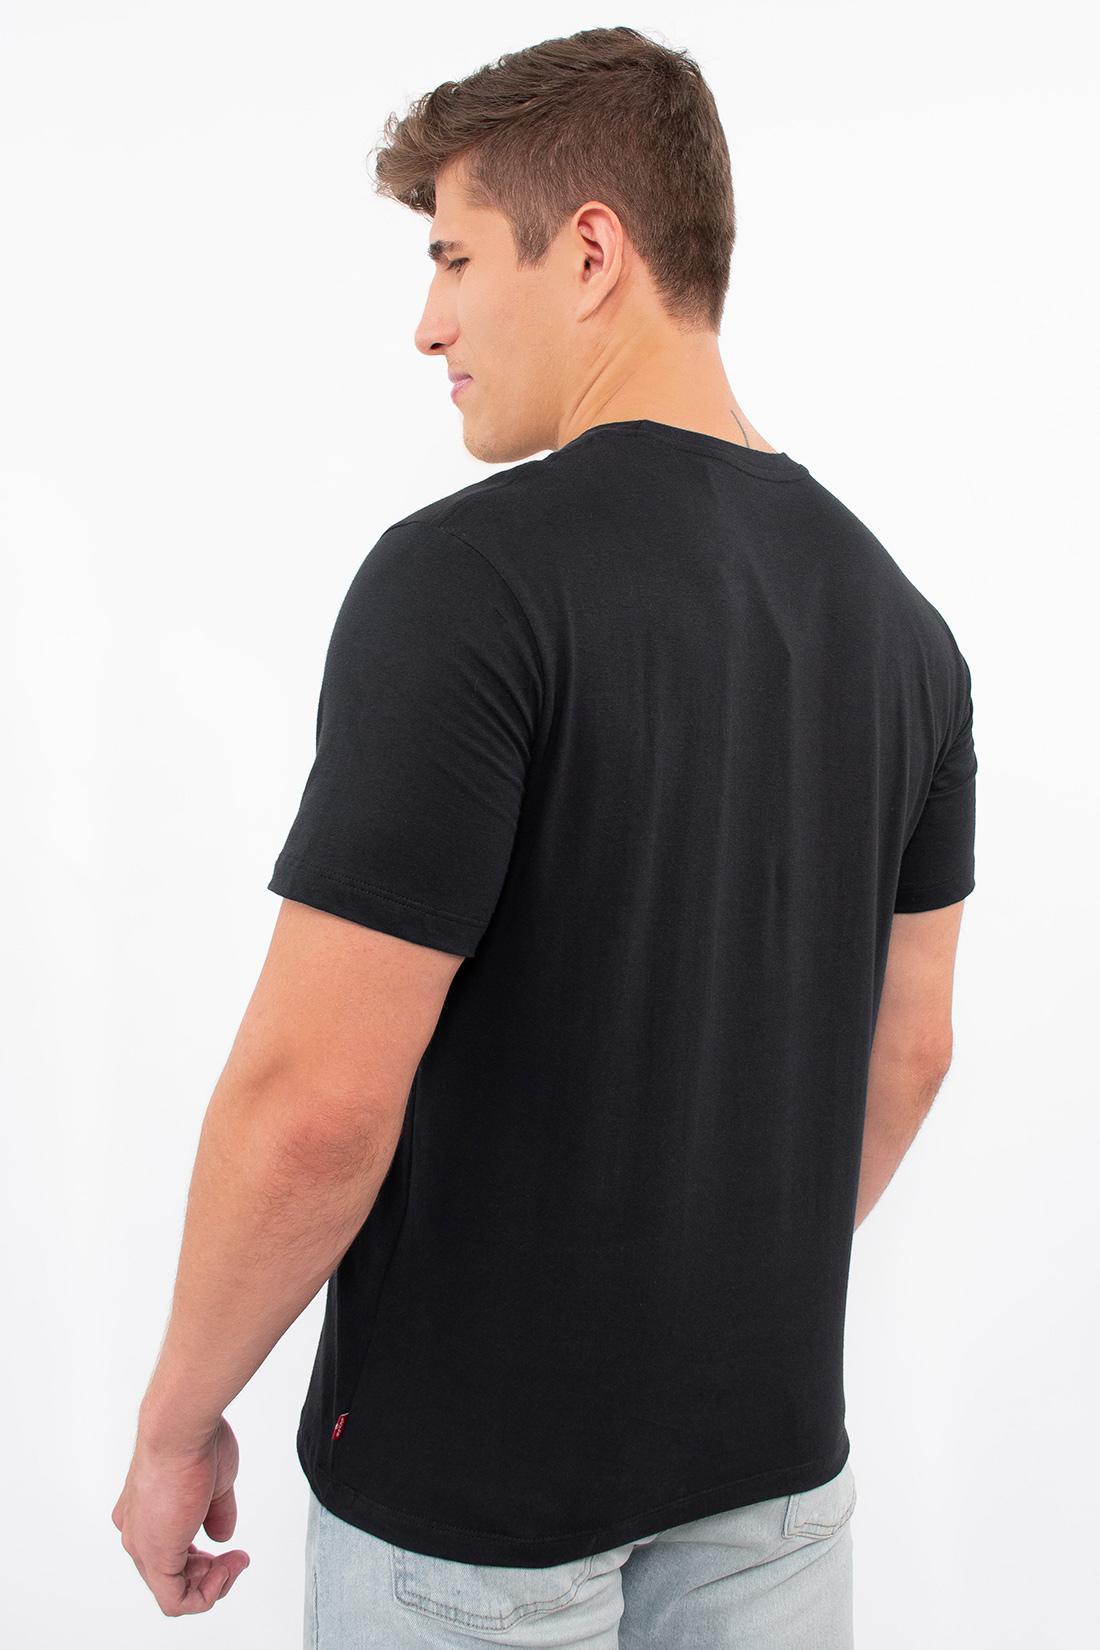 Camiseta Mc Levis Relaxed